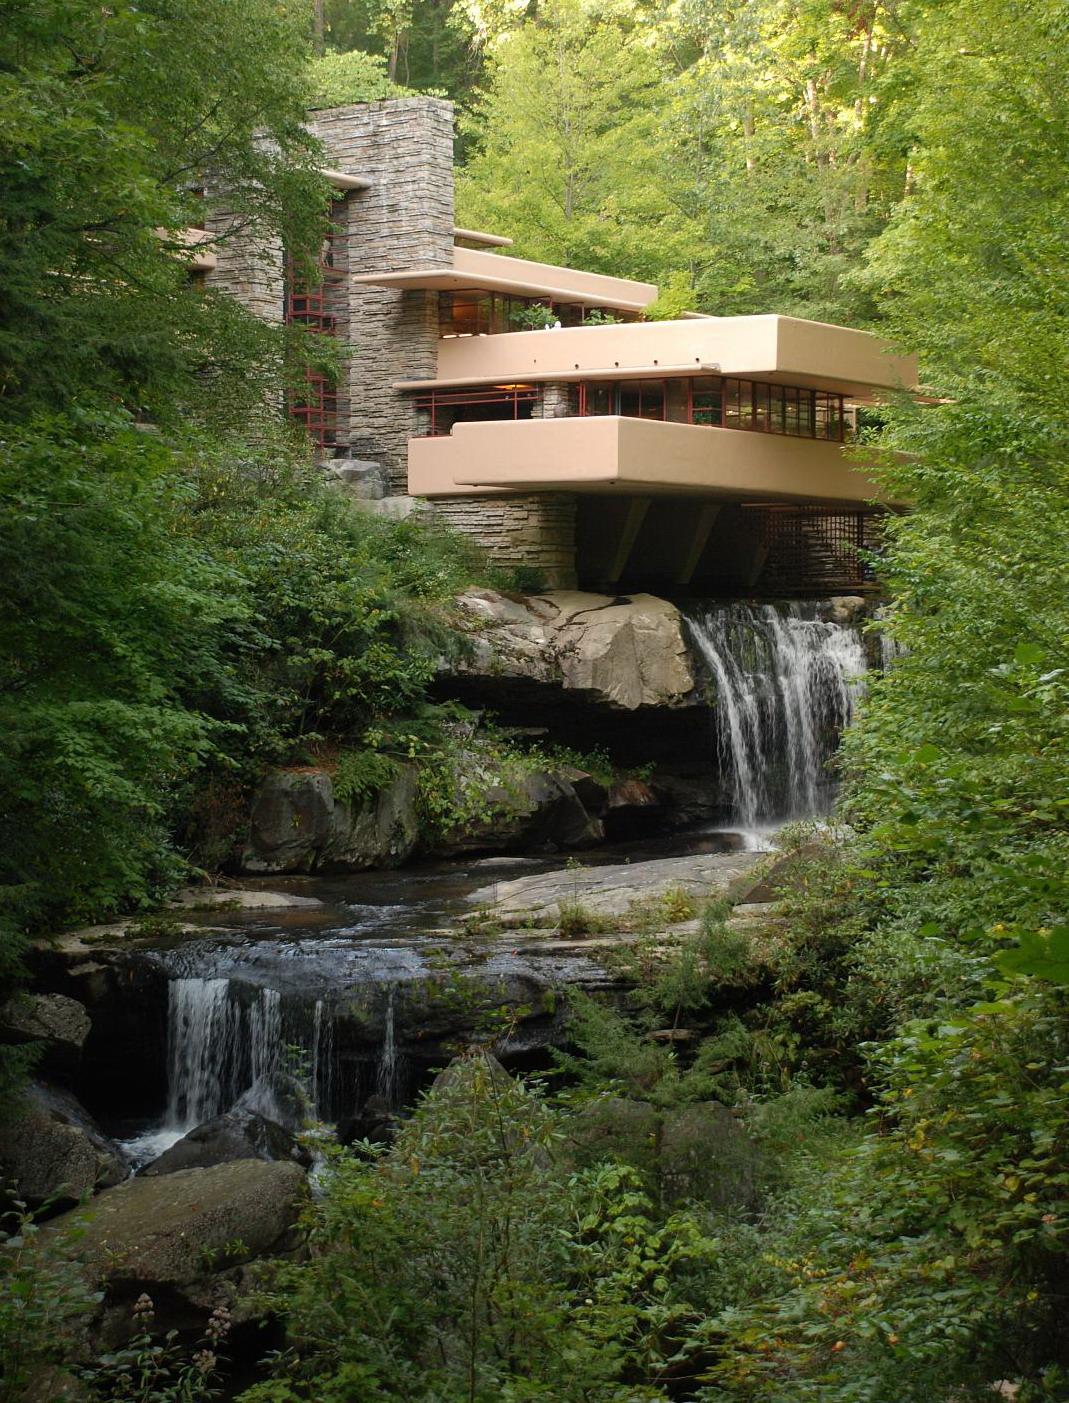 Fallingwater Casa de la Cascada de Frank Lloyd WRIGHT